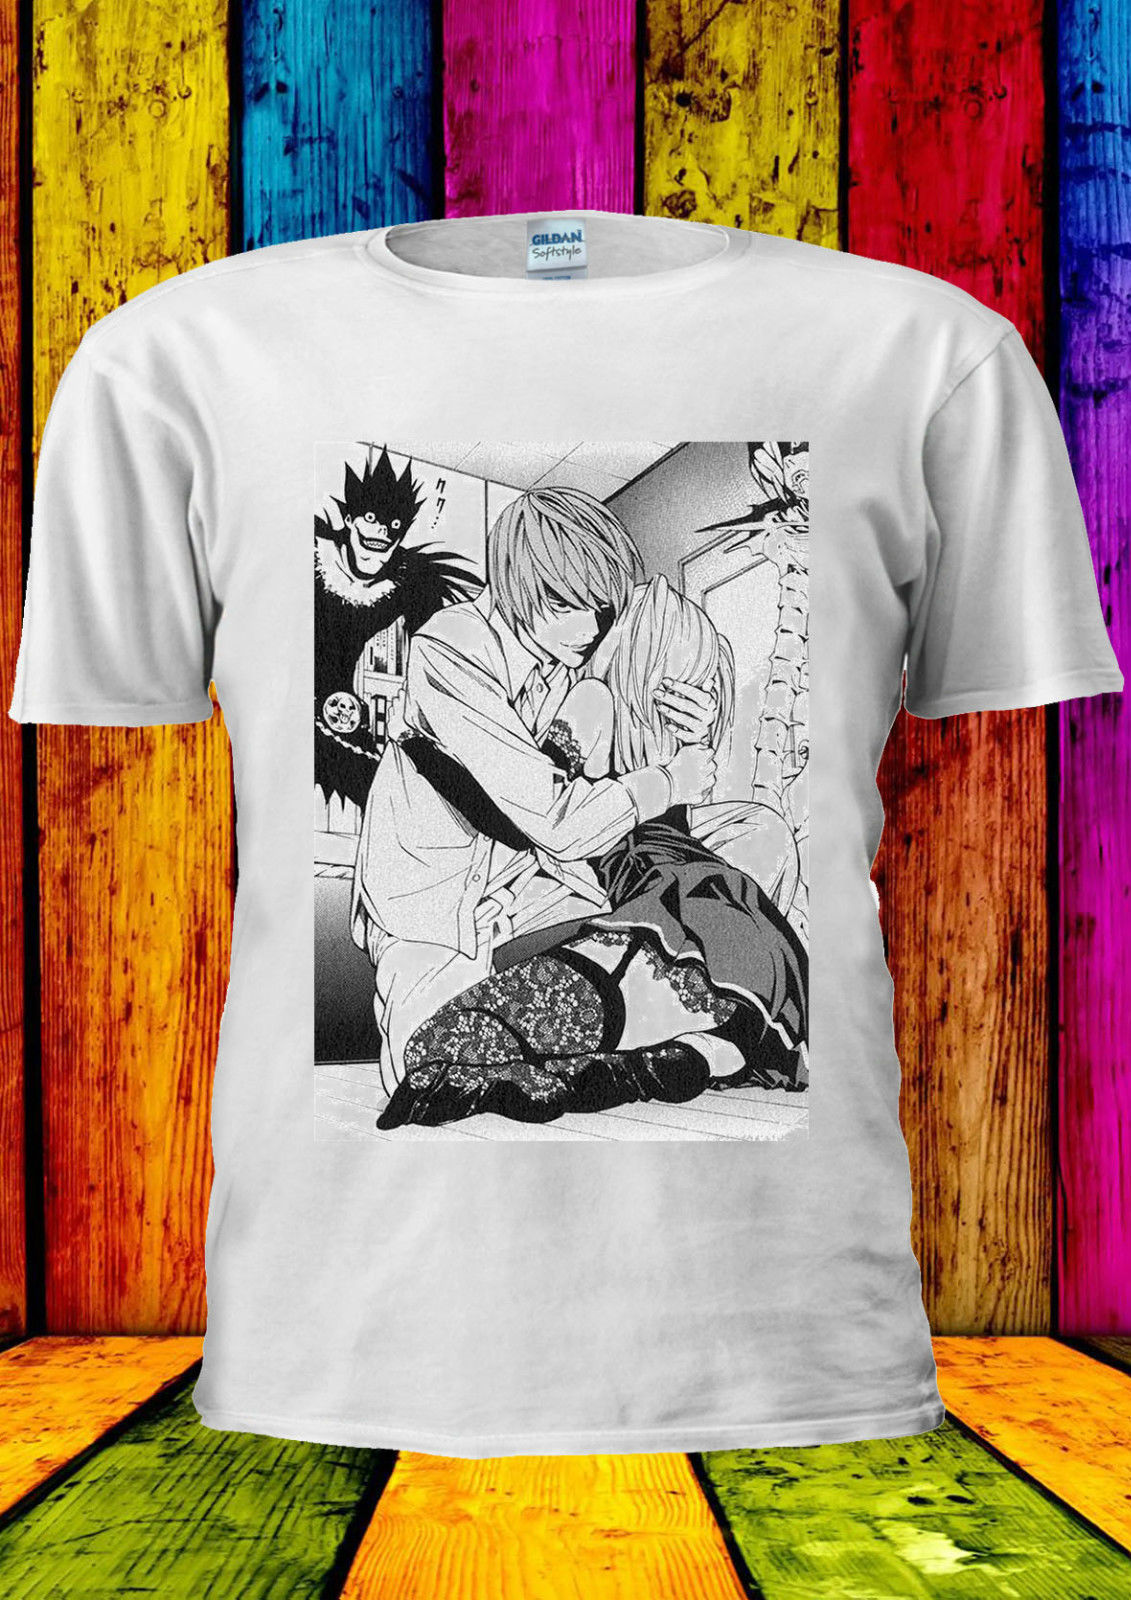 Death Note Light Misa Anime Manga T-shirt Vest Men Women Unisex 353 Cartoon T Shirt Men Unisex New Fashion Tshirt High Quality Materials Tops & Tees